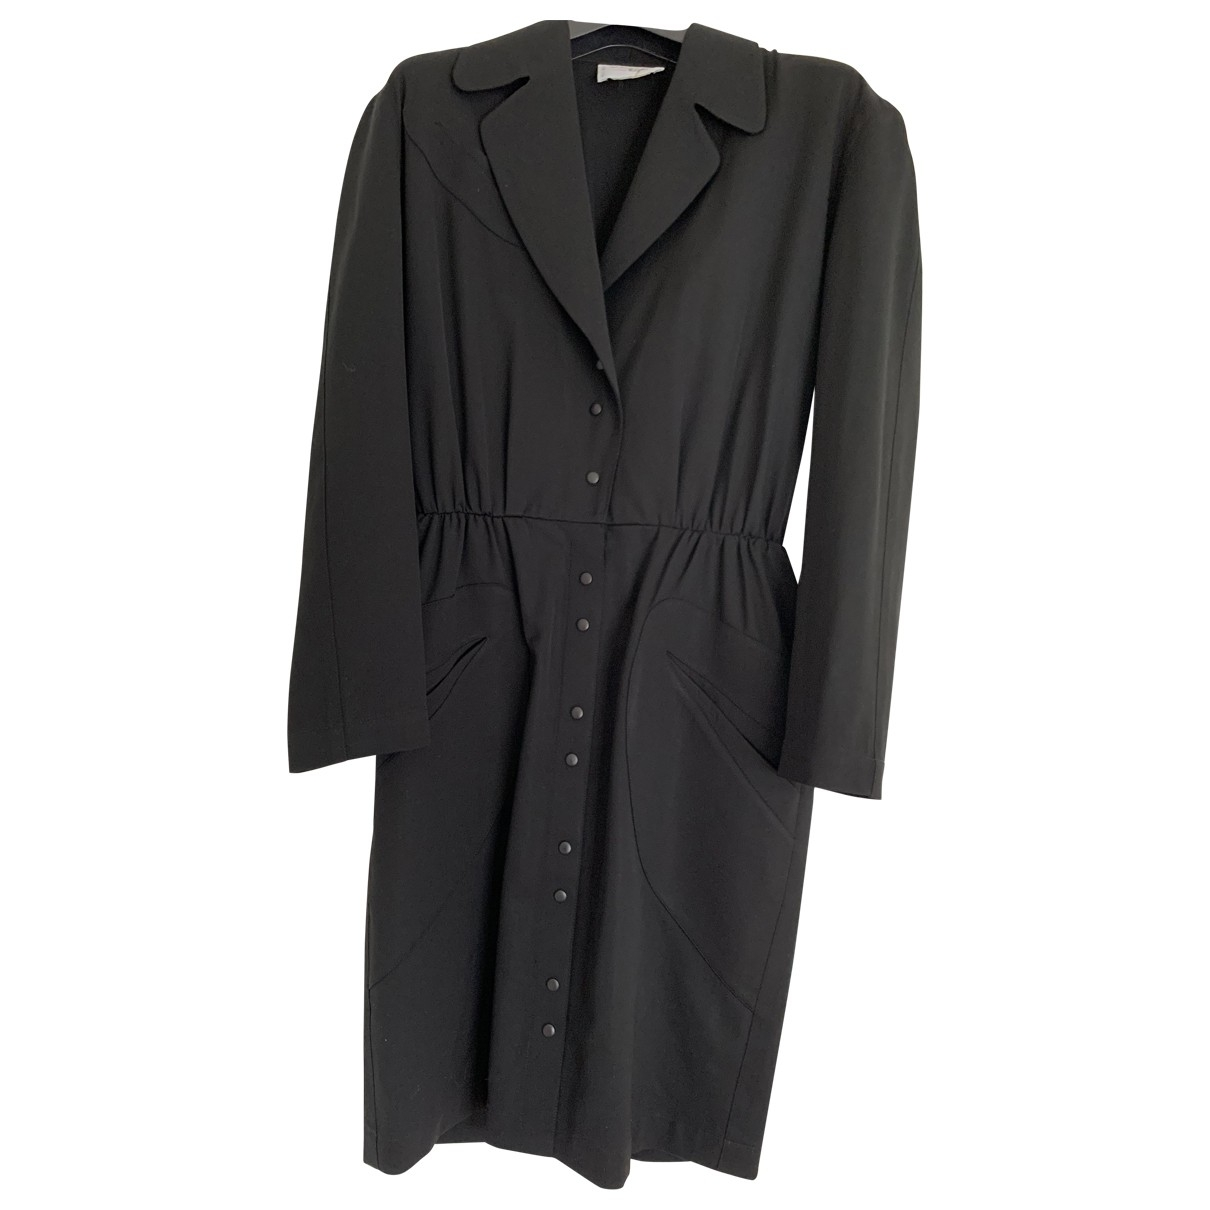 Thierry Mugler \N Black Wool dress for Women 38 FR